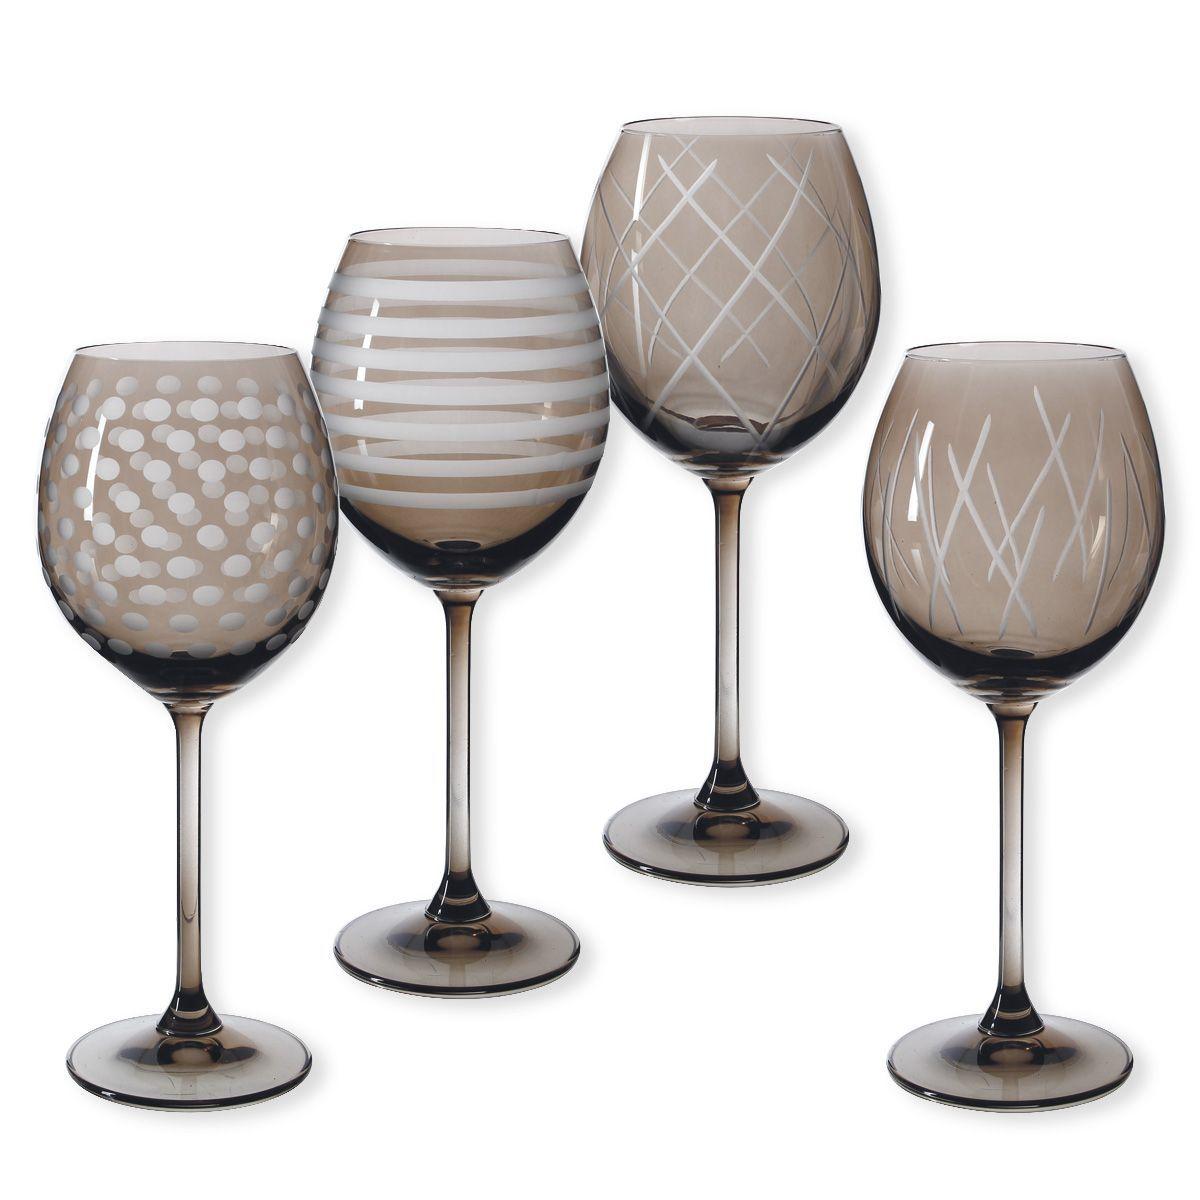 bo te de 4 verres vin quorus vison bruno evrard cr ation. Black Bedroom Furniture Sets. Home Design Ideas